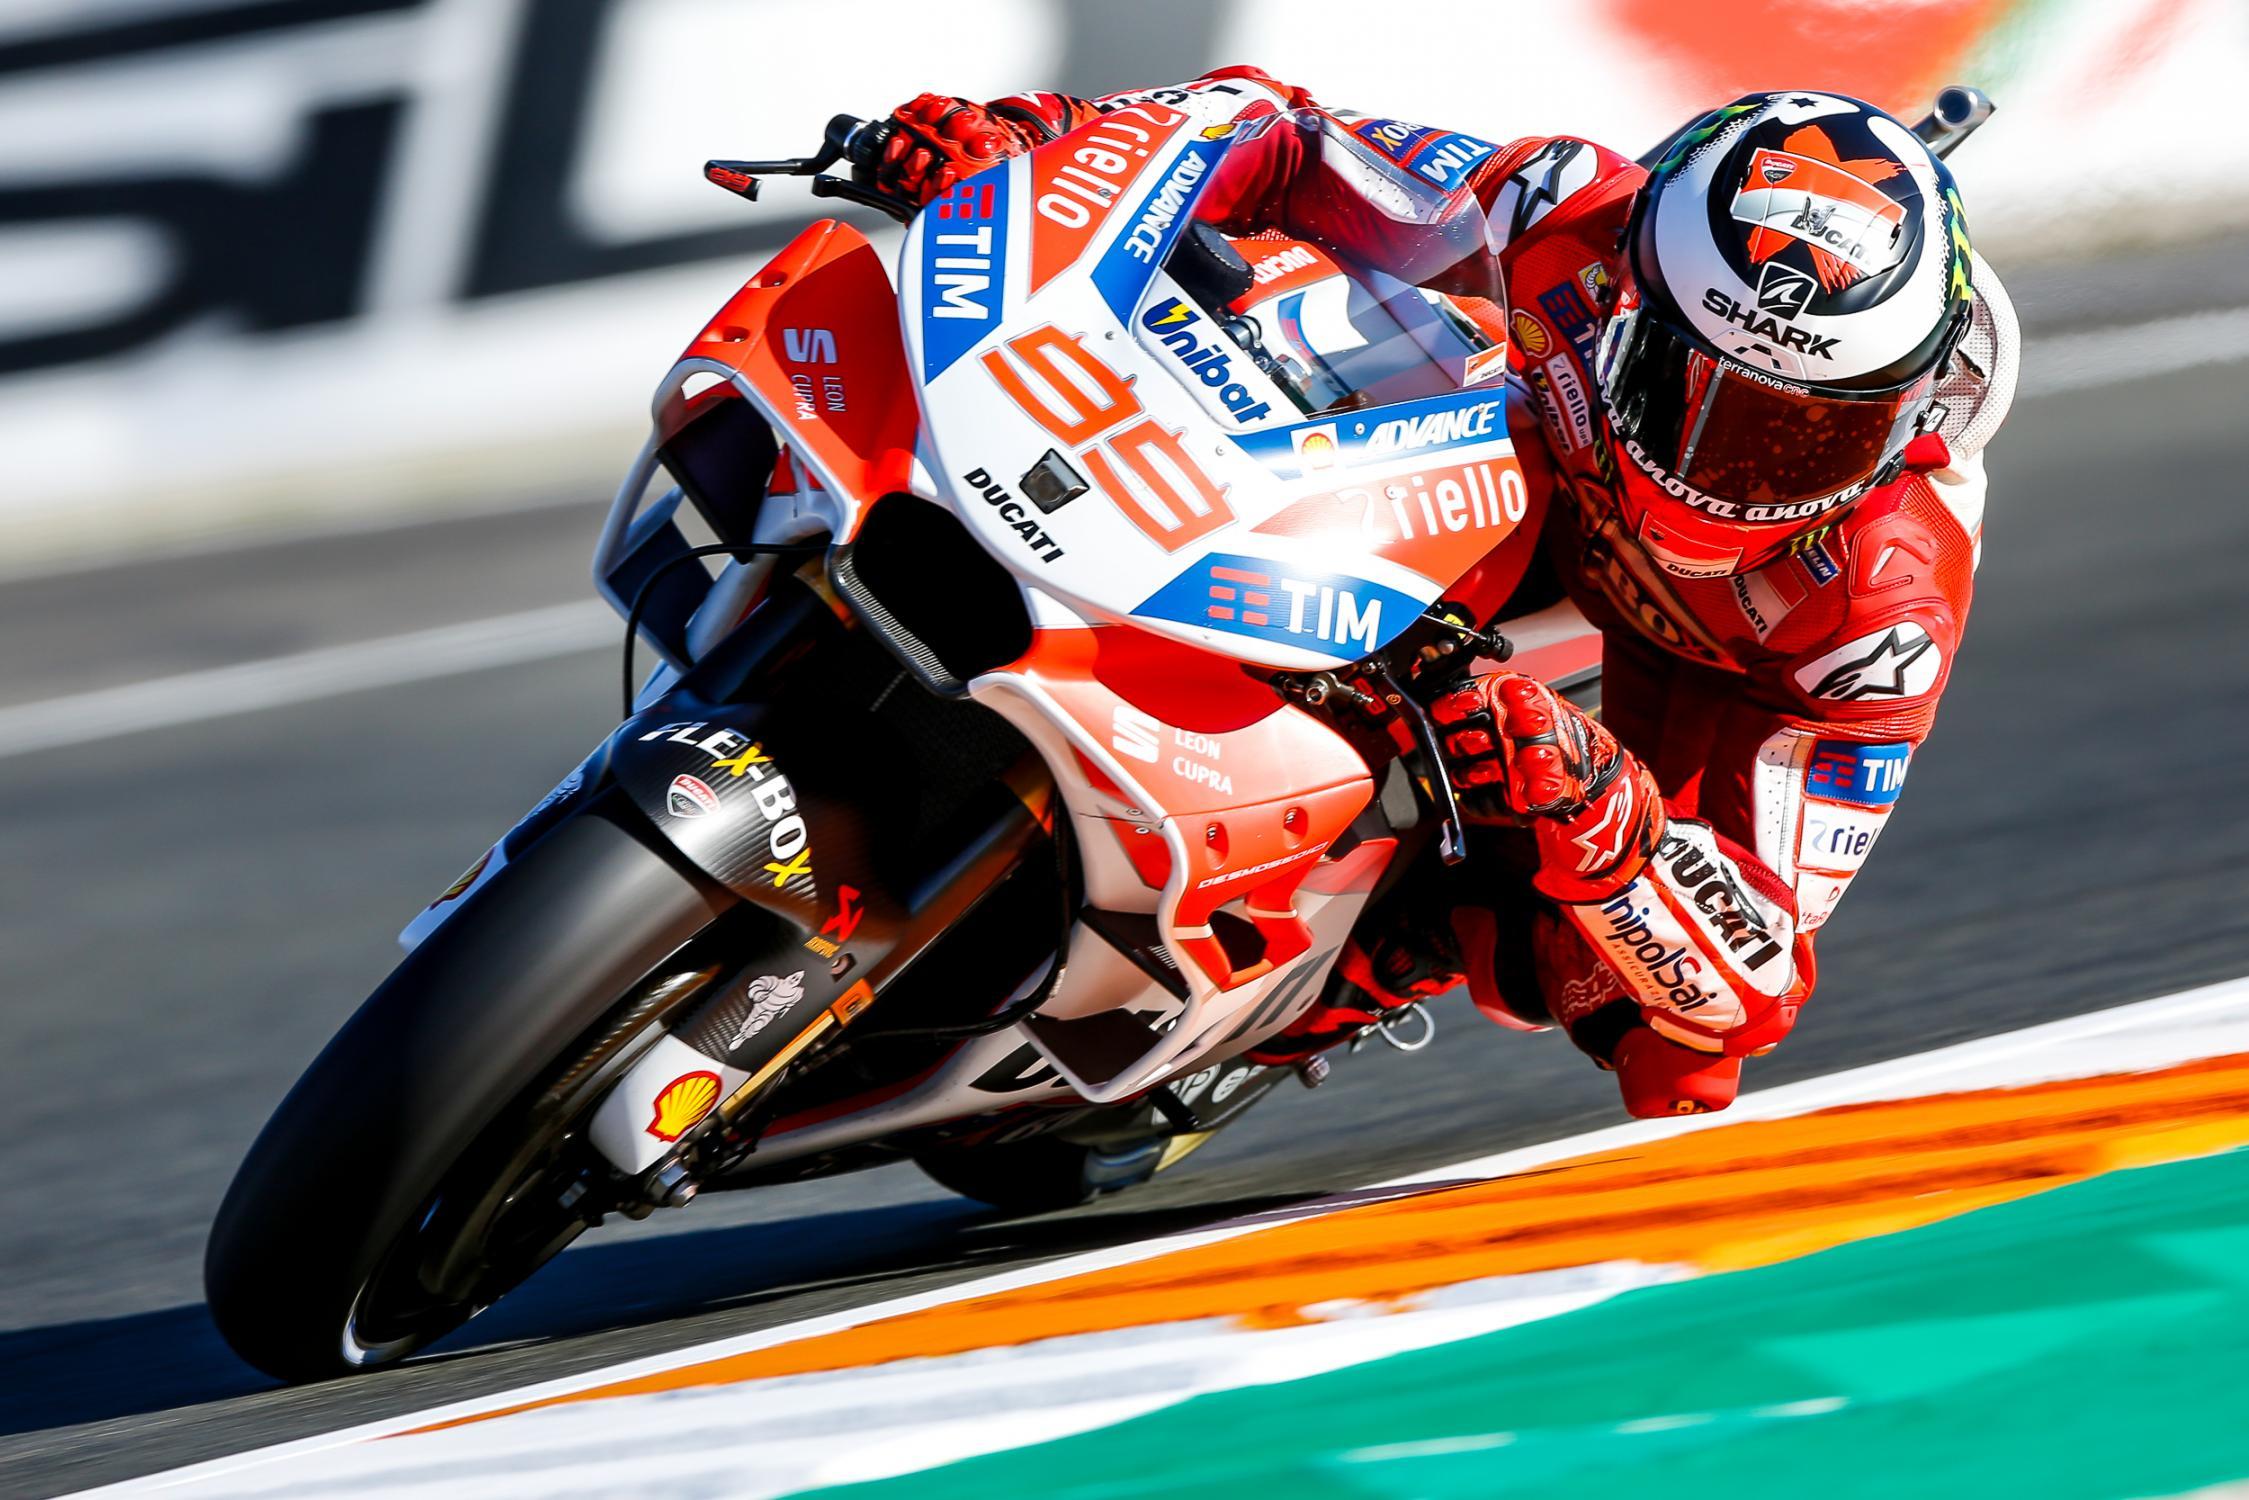 [GP] Valencia 99-jorge-lorenzo-esp_gp_3813.gallery_full_top_fullscreen